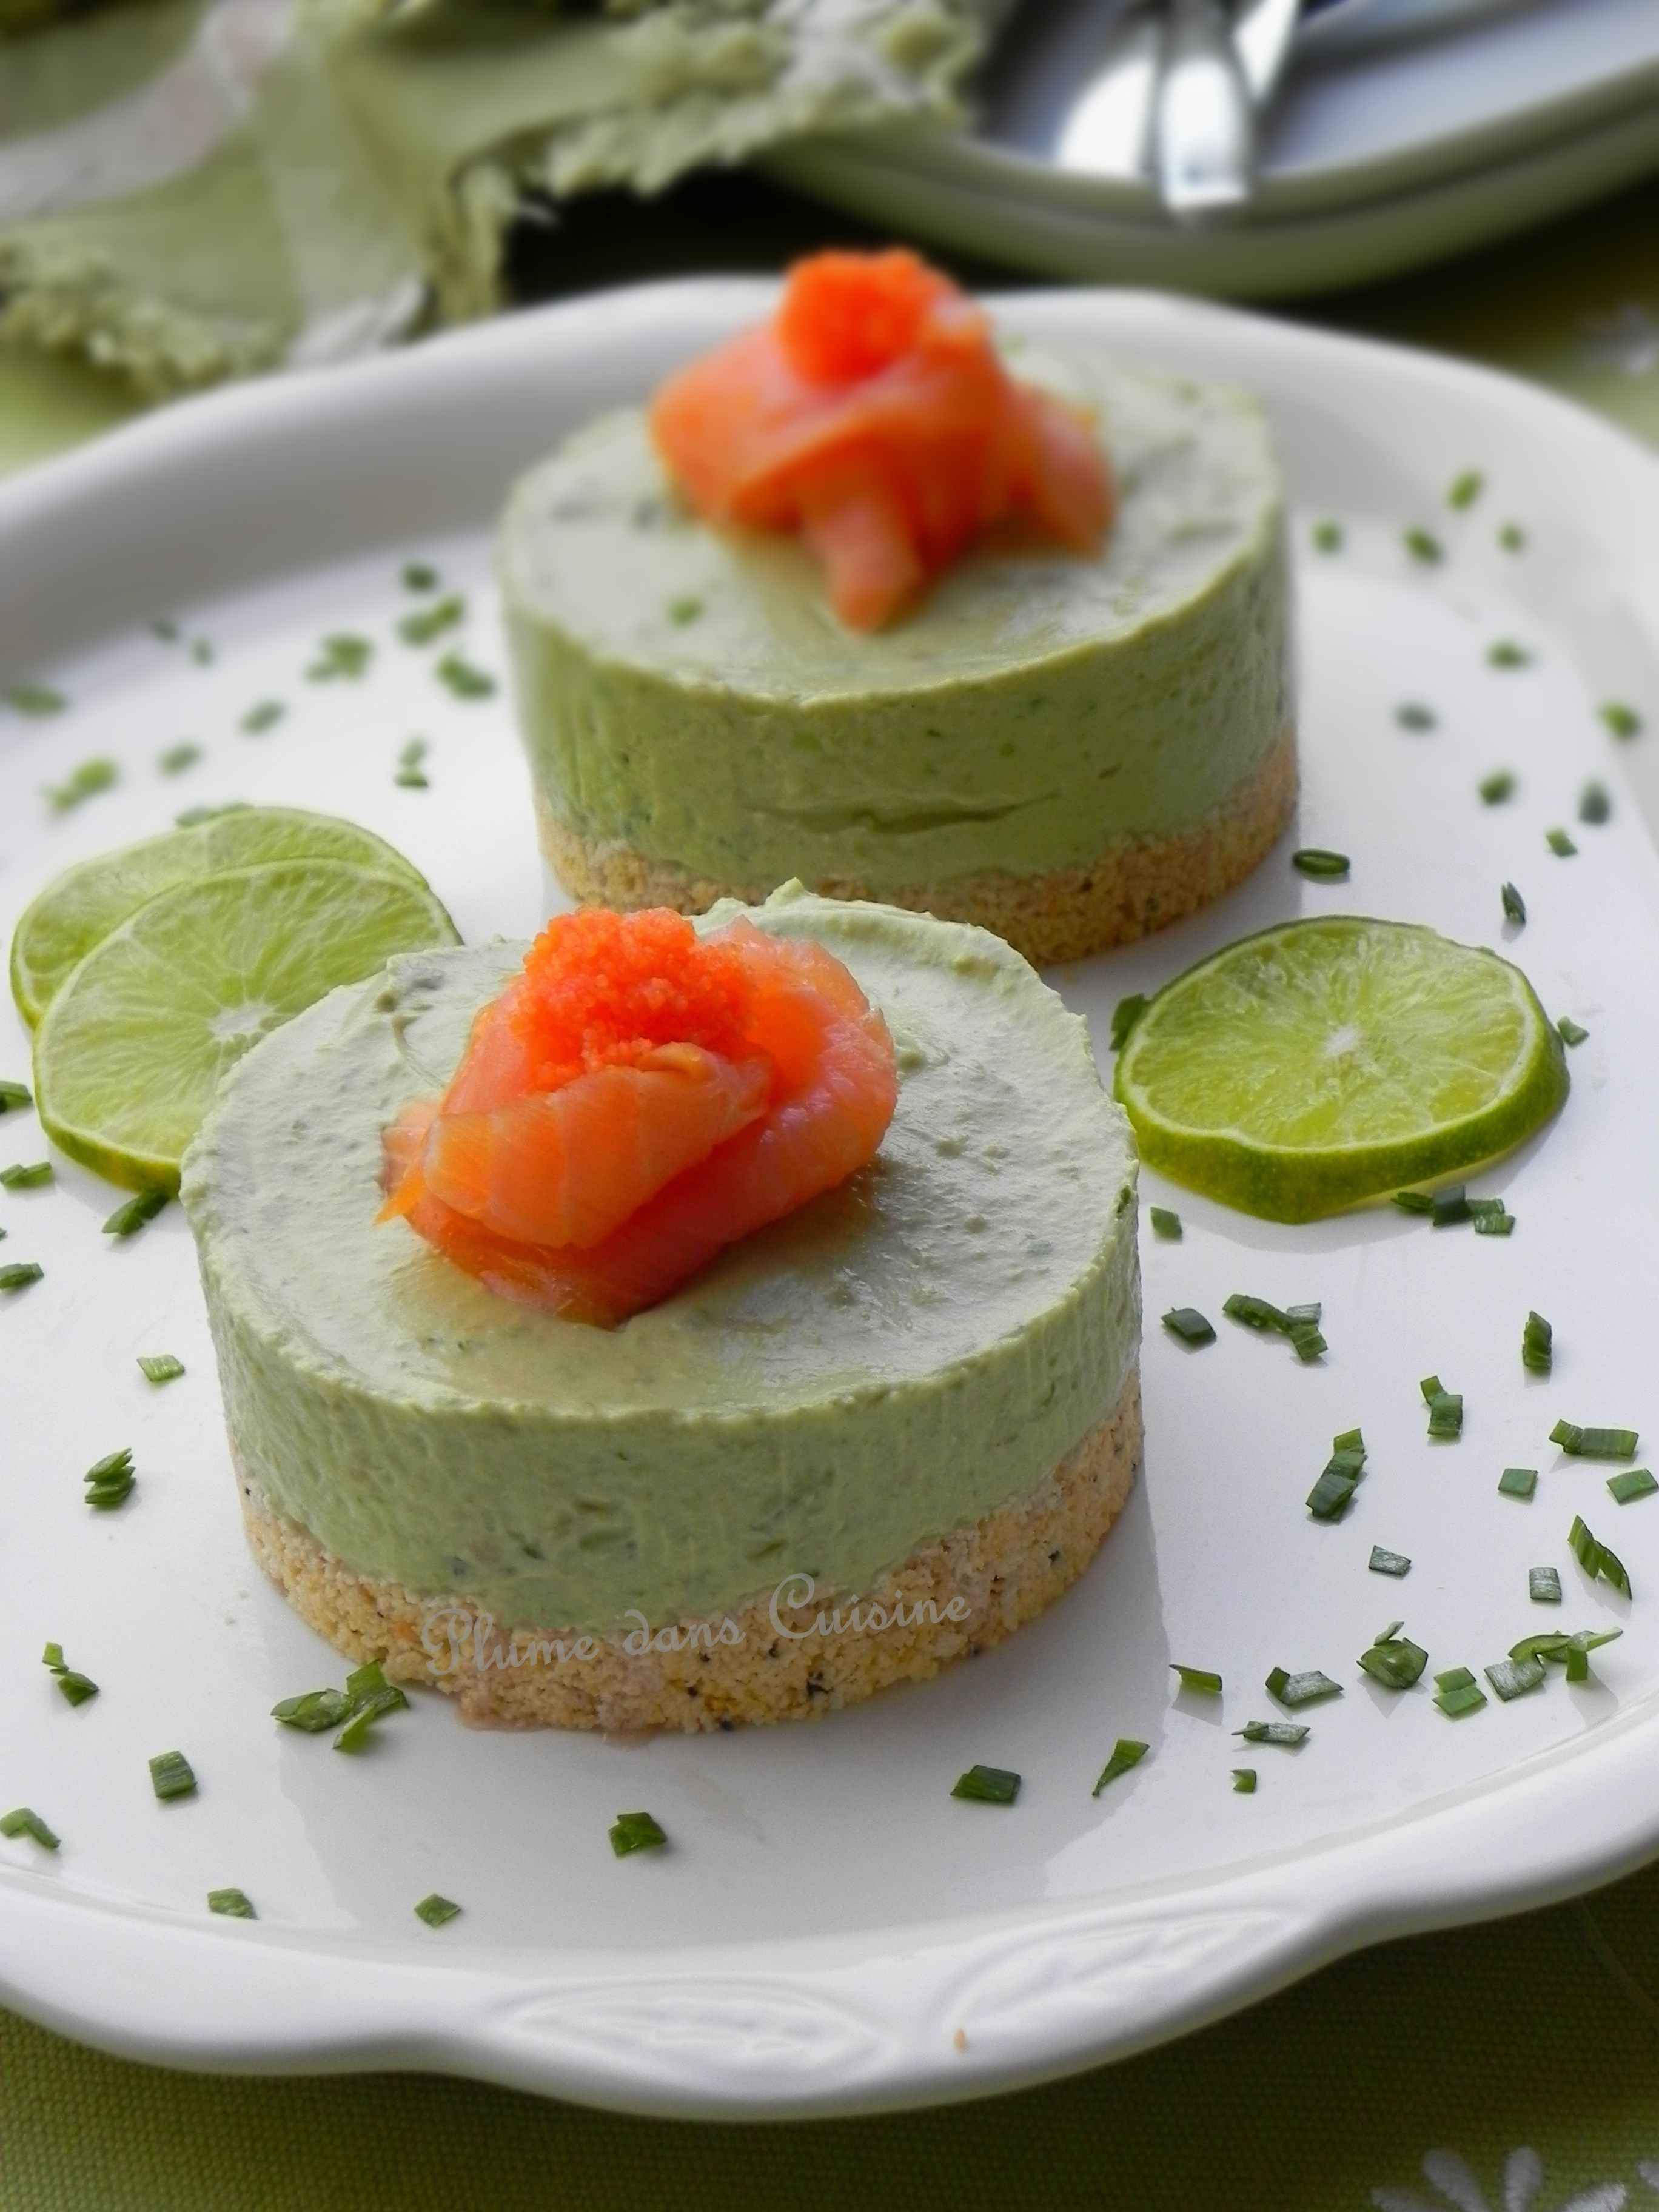 cheesecake avocat saumon 2 entr e pinterest avocat saumon cheesecake et avocat. Black Bedroom Furniture Sets. Home Design Ideas